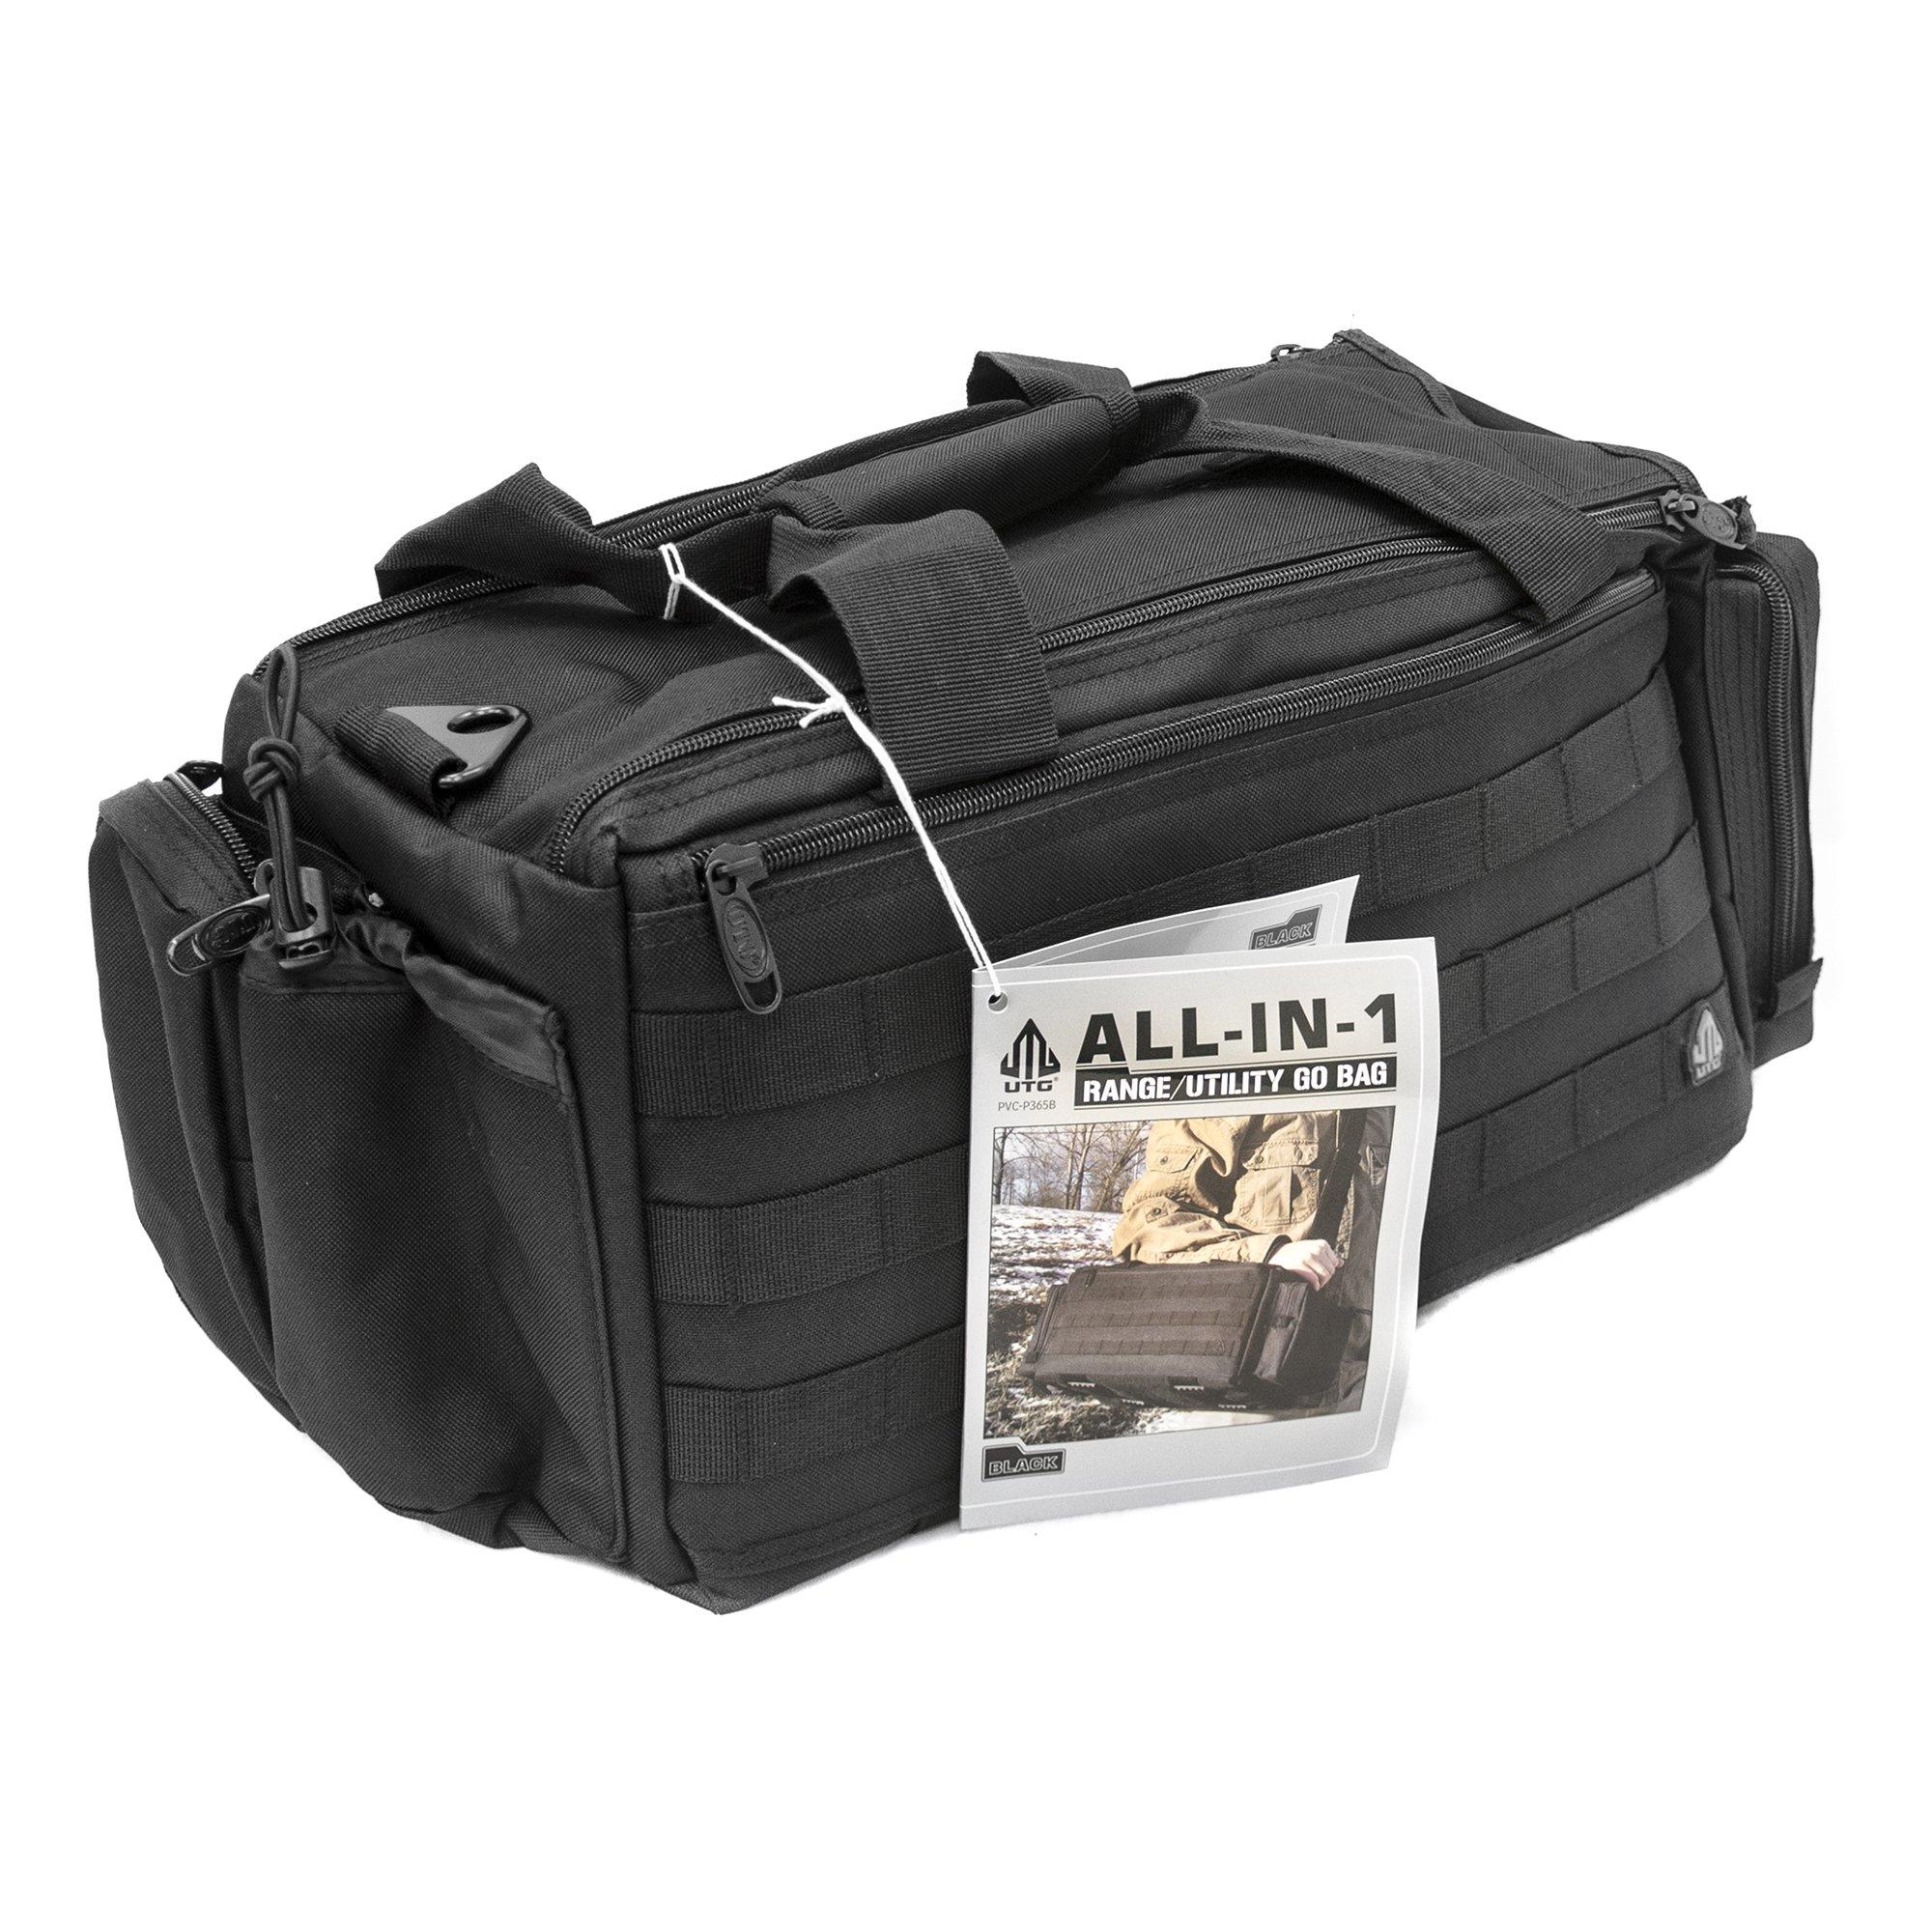 UTG All in One Range/Utility Go Bag, Black, 21'' x 10'' x 9'' by UTG (Image #15)